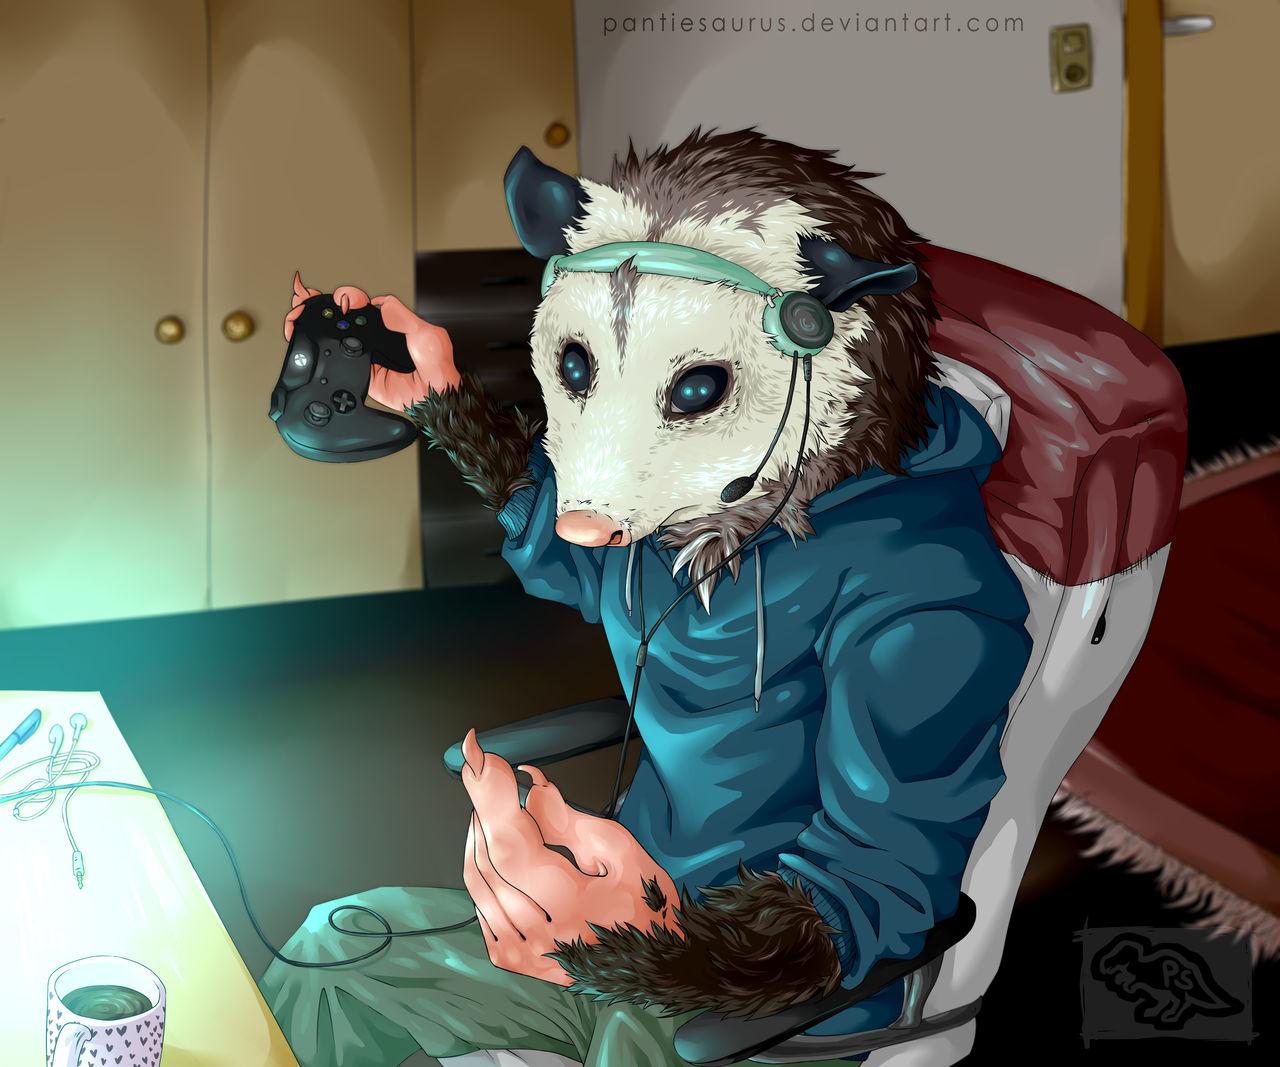 Teamspeak Opossum